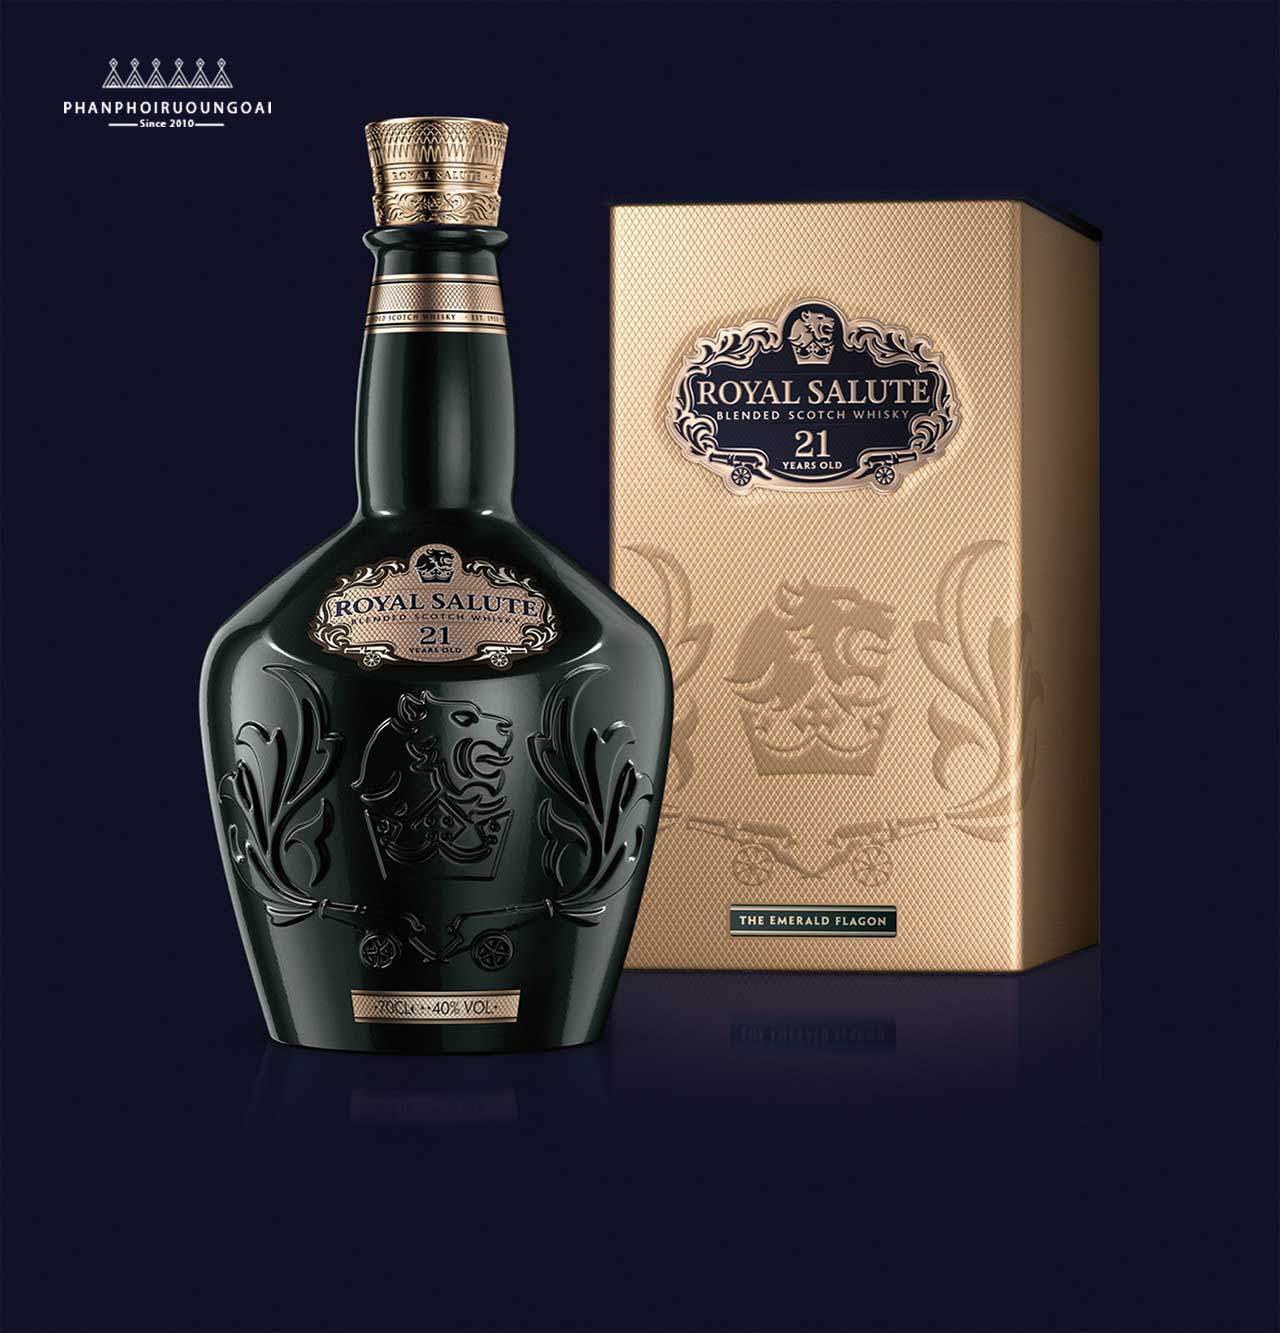 Rượu Royal Salute 21 năm Emerald Flagon